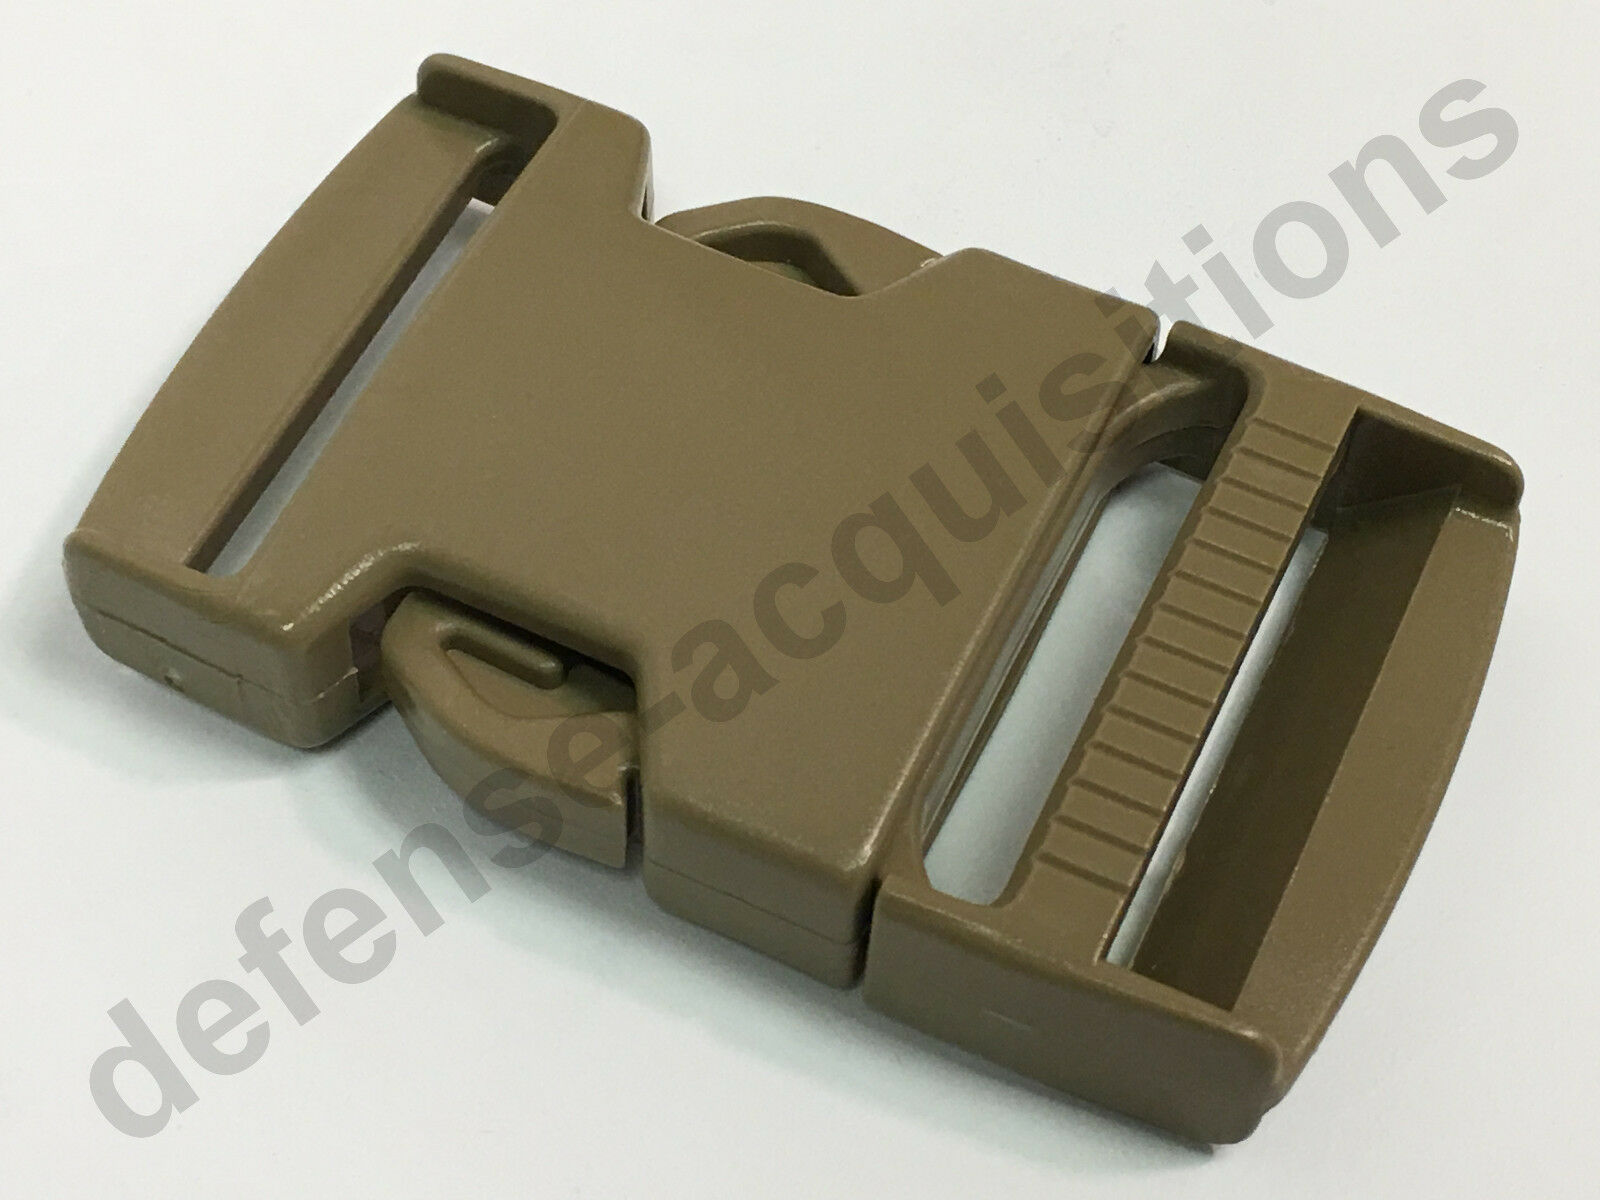 1.5 Inch Width Side Release Plastic Buckles ITW Nexus SR 1 1//2 Buckle 1 Buckle